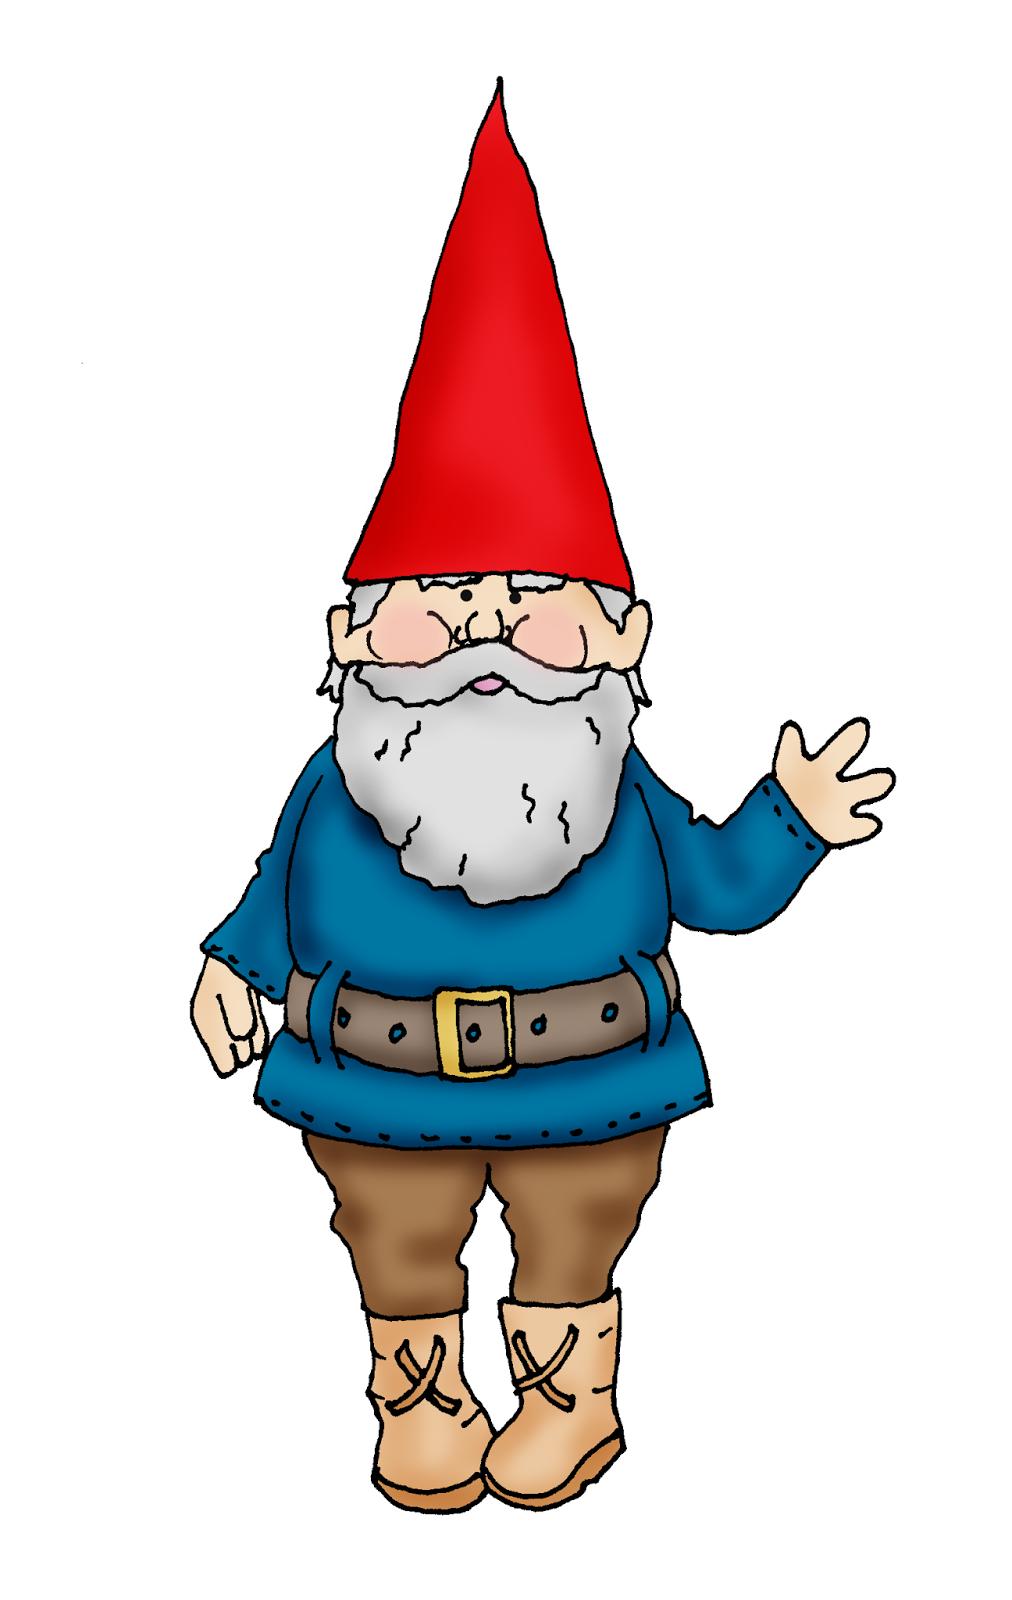 Gnome - Gnome, Transparent background PNG HD thumbnail